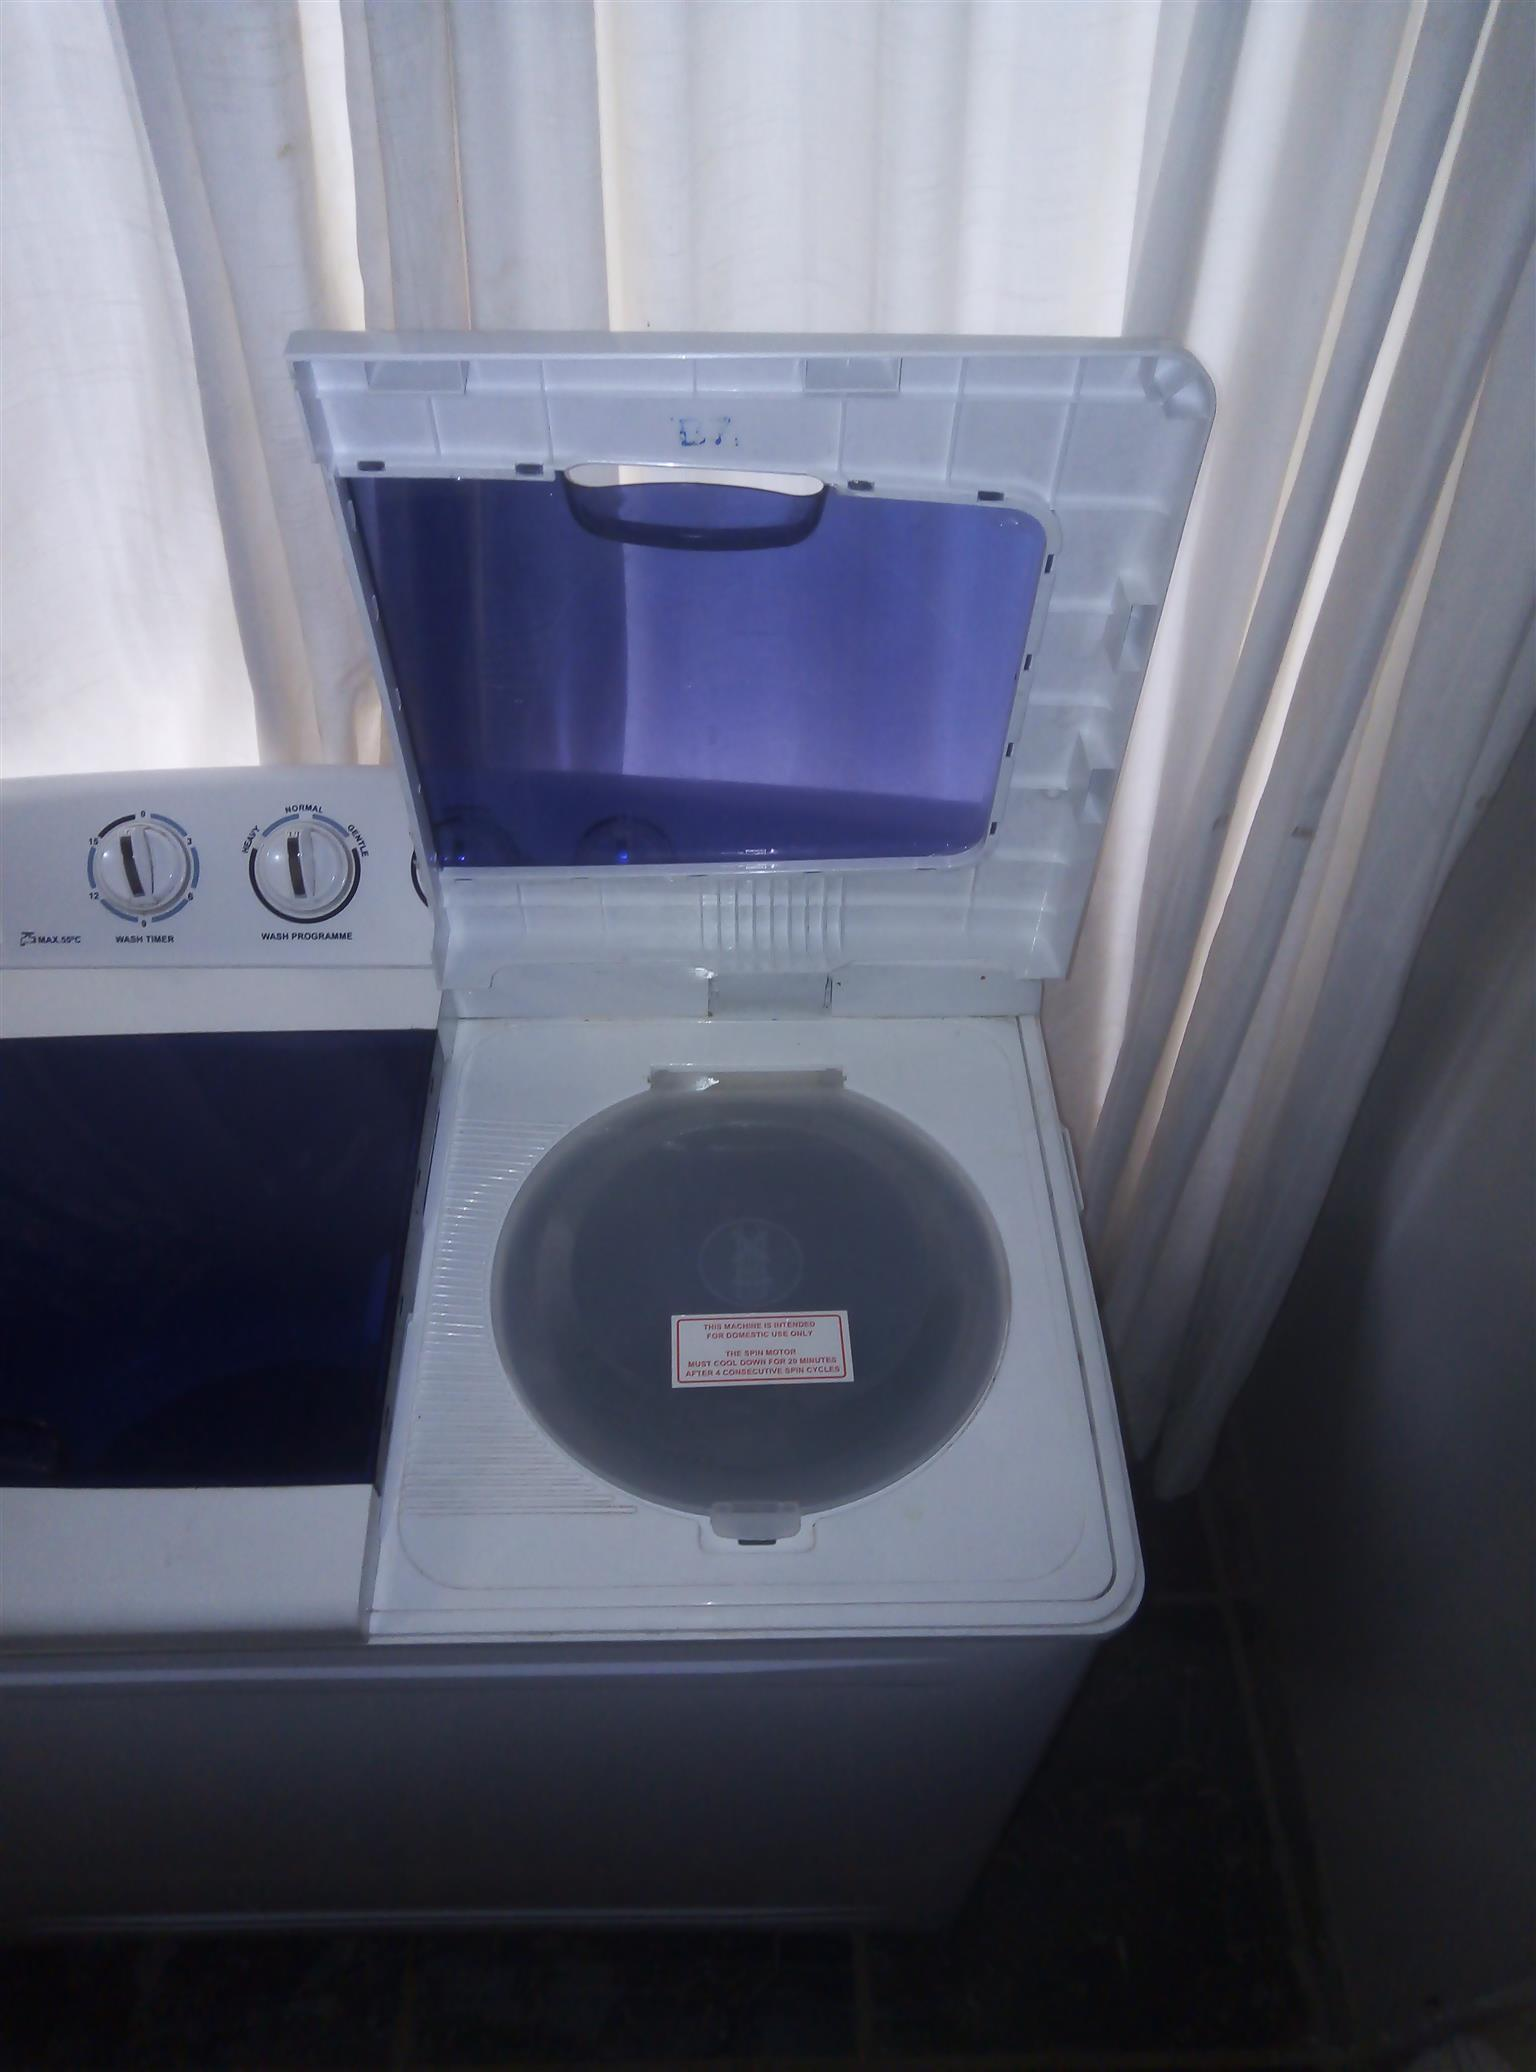 DEFY Twin-Tub WASHING MACHINE